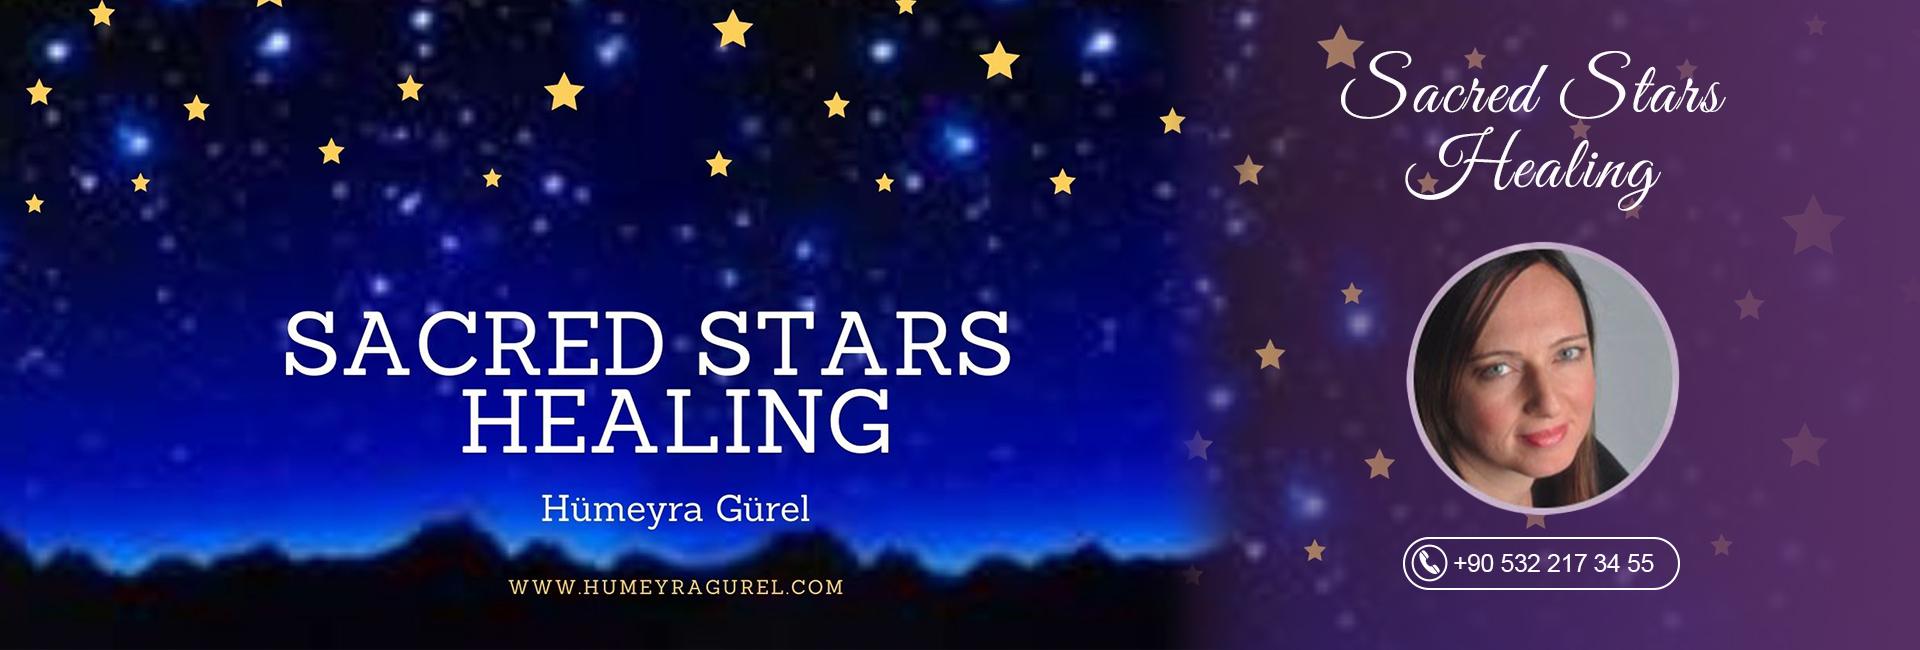 Sacred Stars Healing